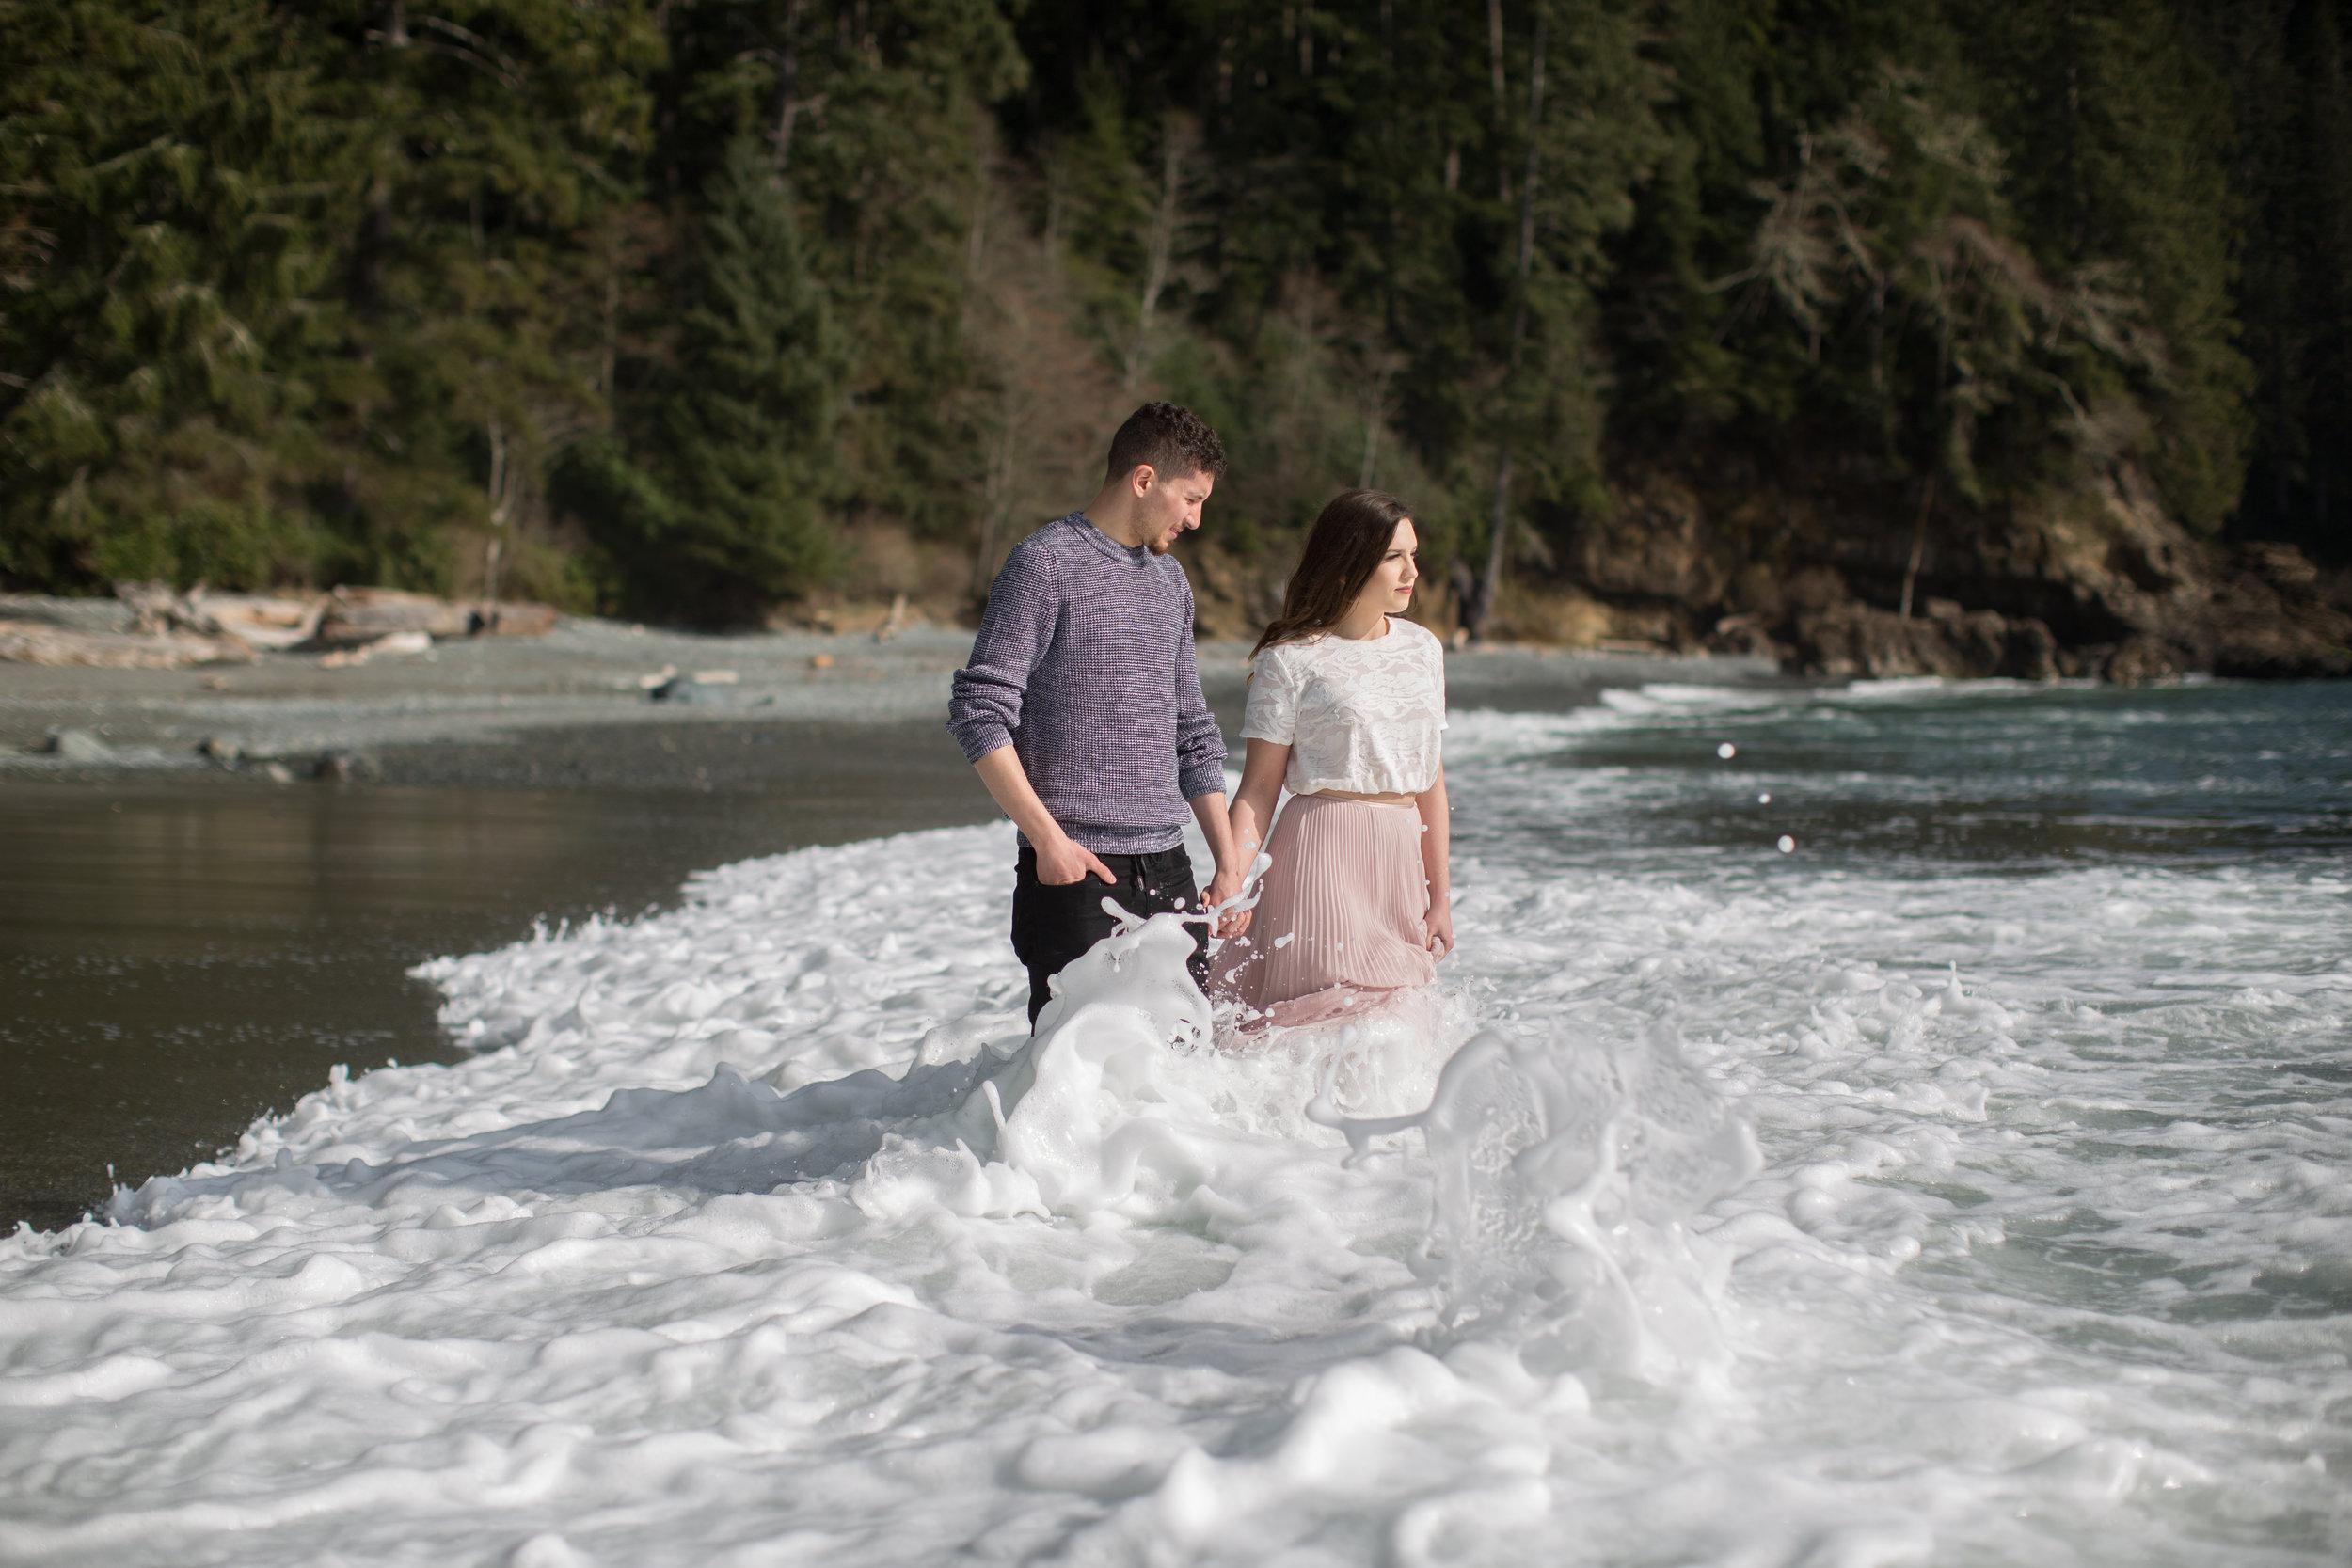 Adam-Ziorio-Photography-Victoria-BC-Epic-Engagement-photos.jpg